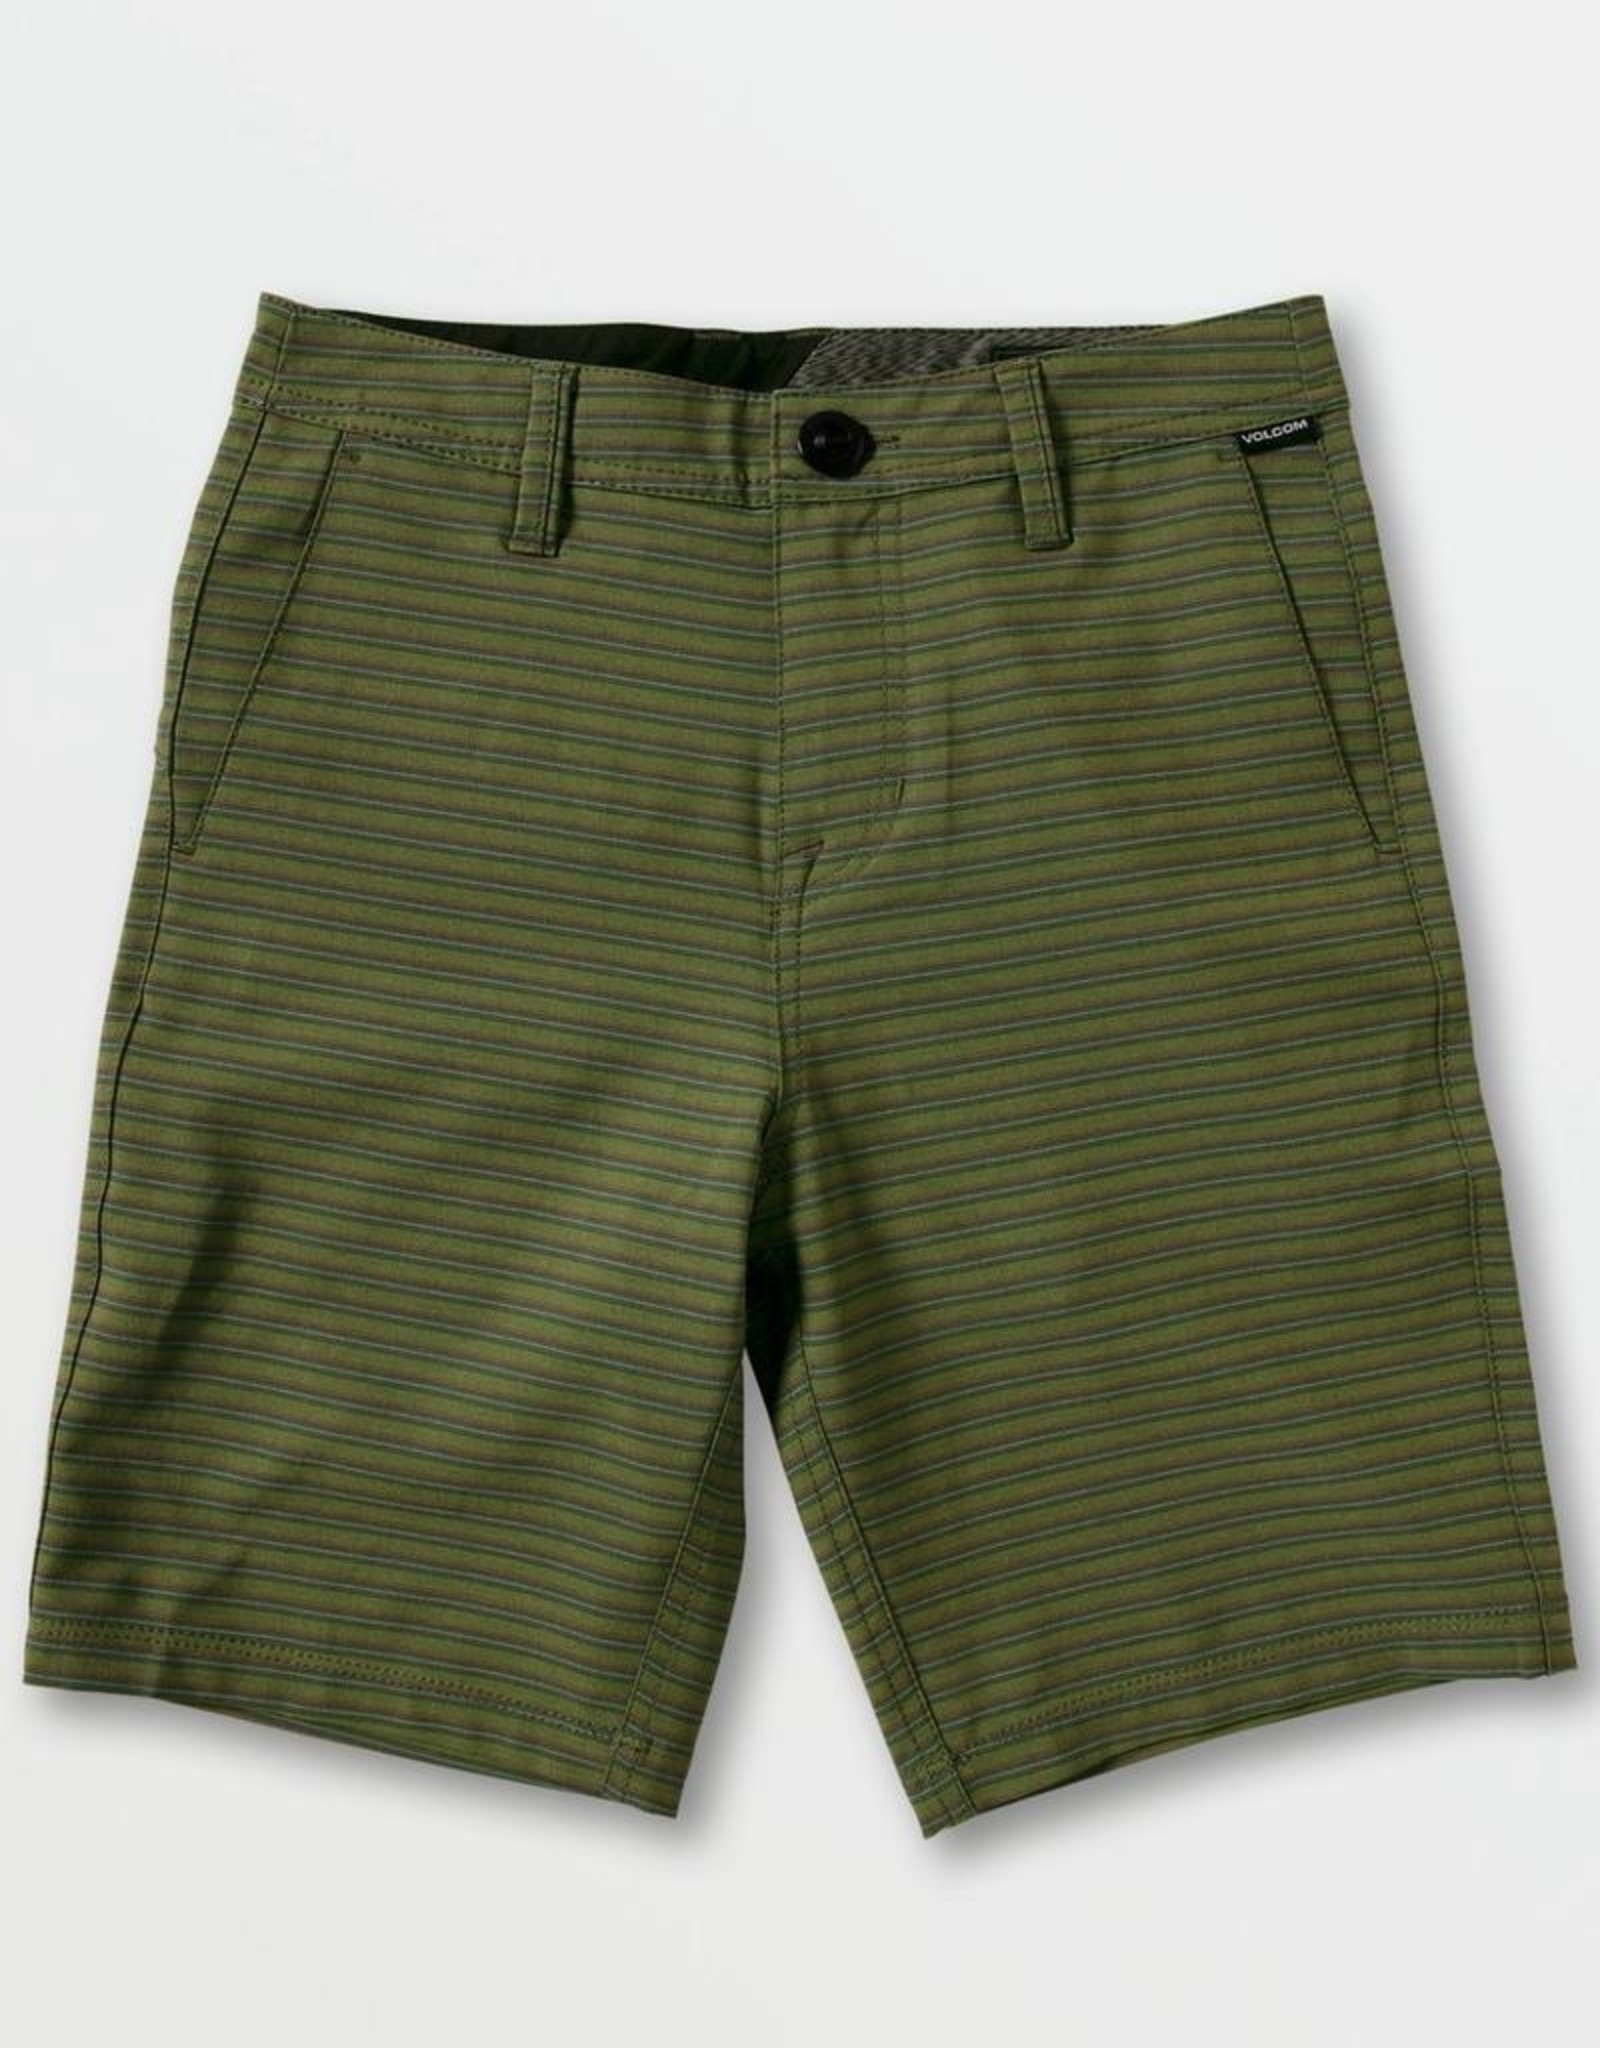 Big Boys Old Mill Fricken Surf N' Turf Static Shorts